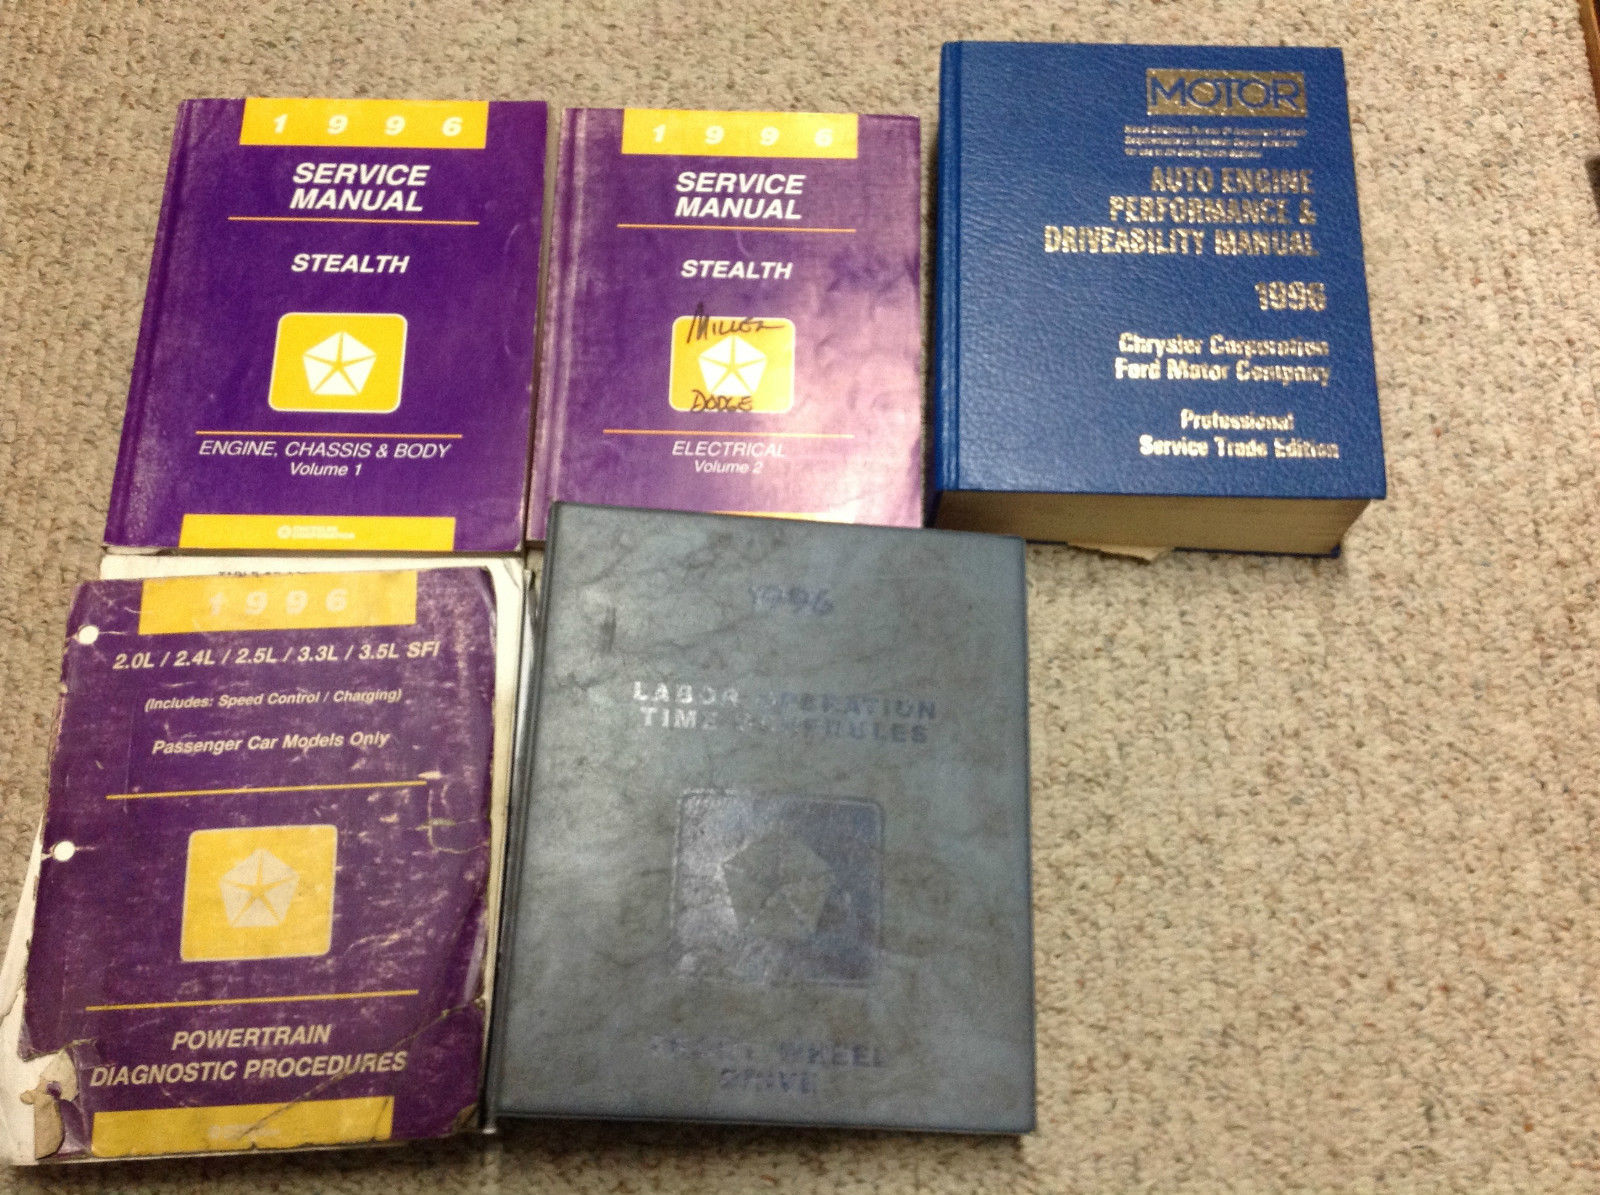 dodge stealth manual 1990s 19 listings rh bonanza com 1994 dodge stealth service manual 1994 dodge stealth service manual